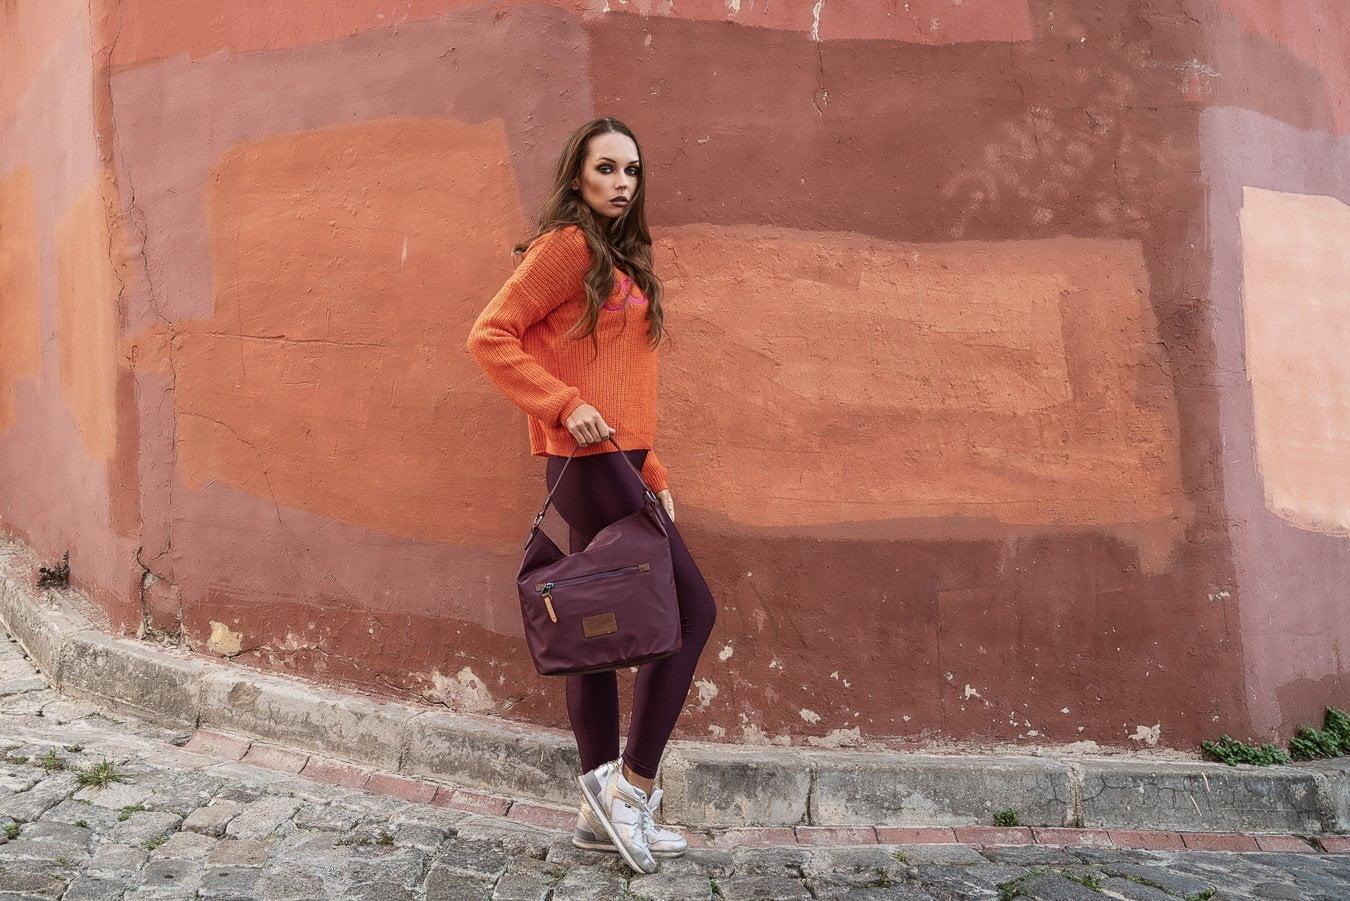 Moda Çekimi - Editorial - Beauty moda tekstil burakbulutfotografatolyesi 21